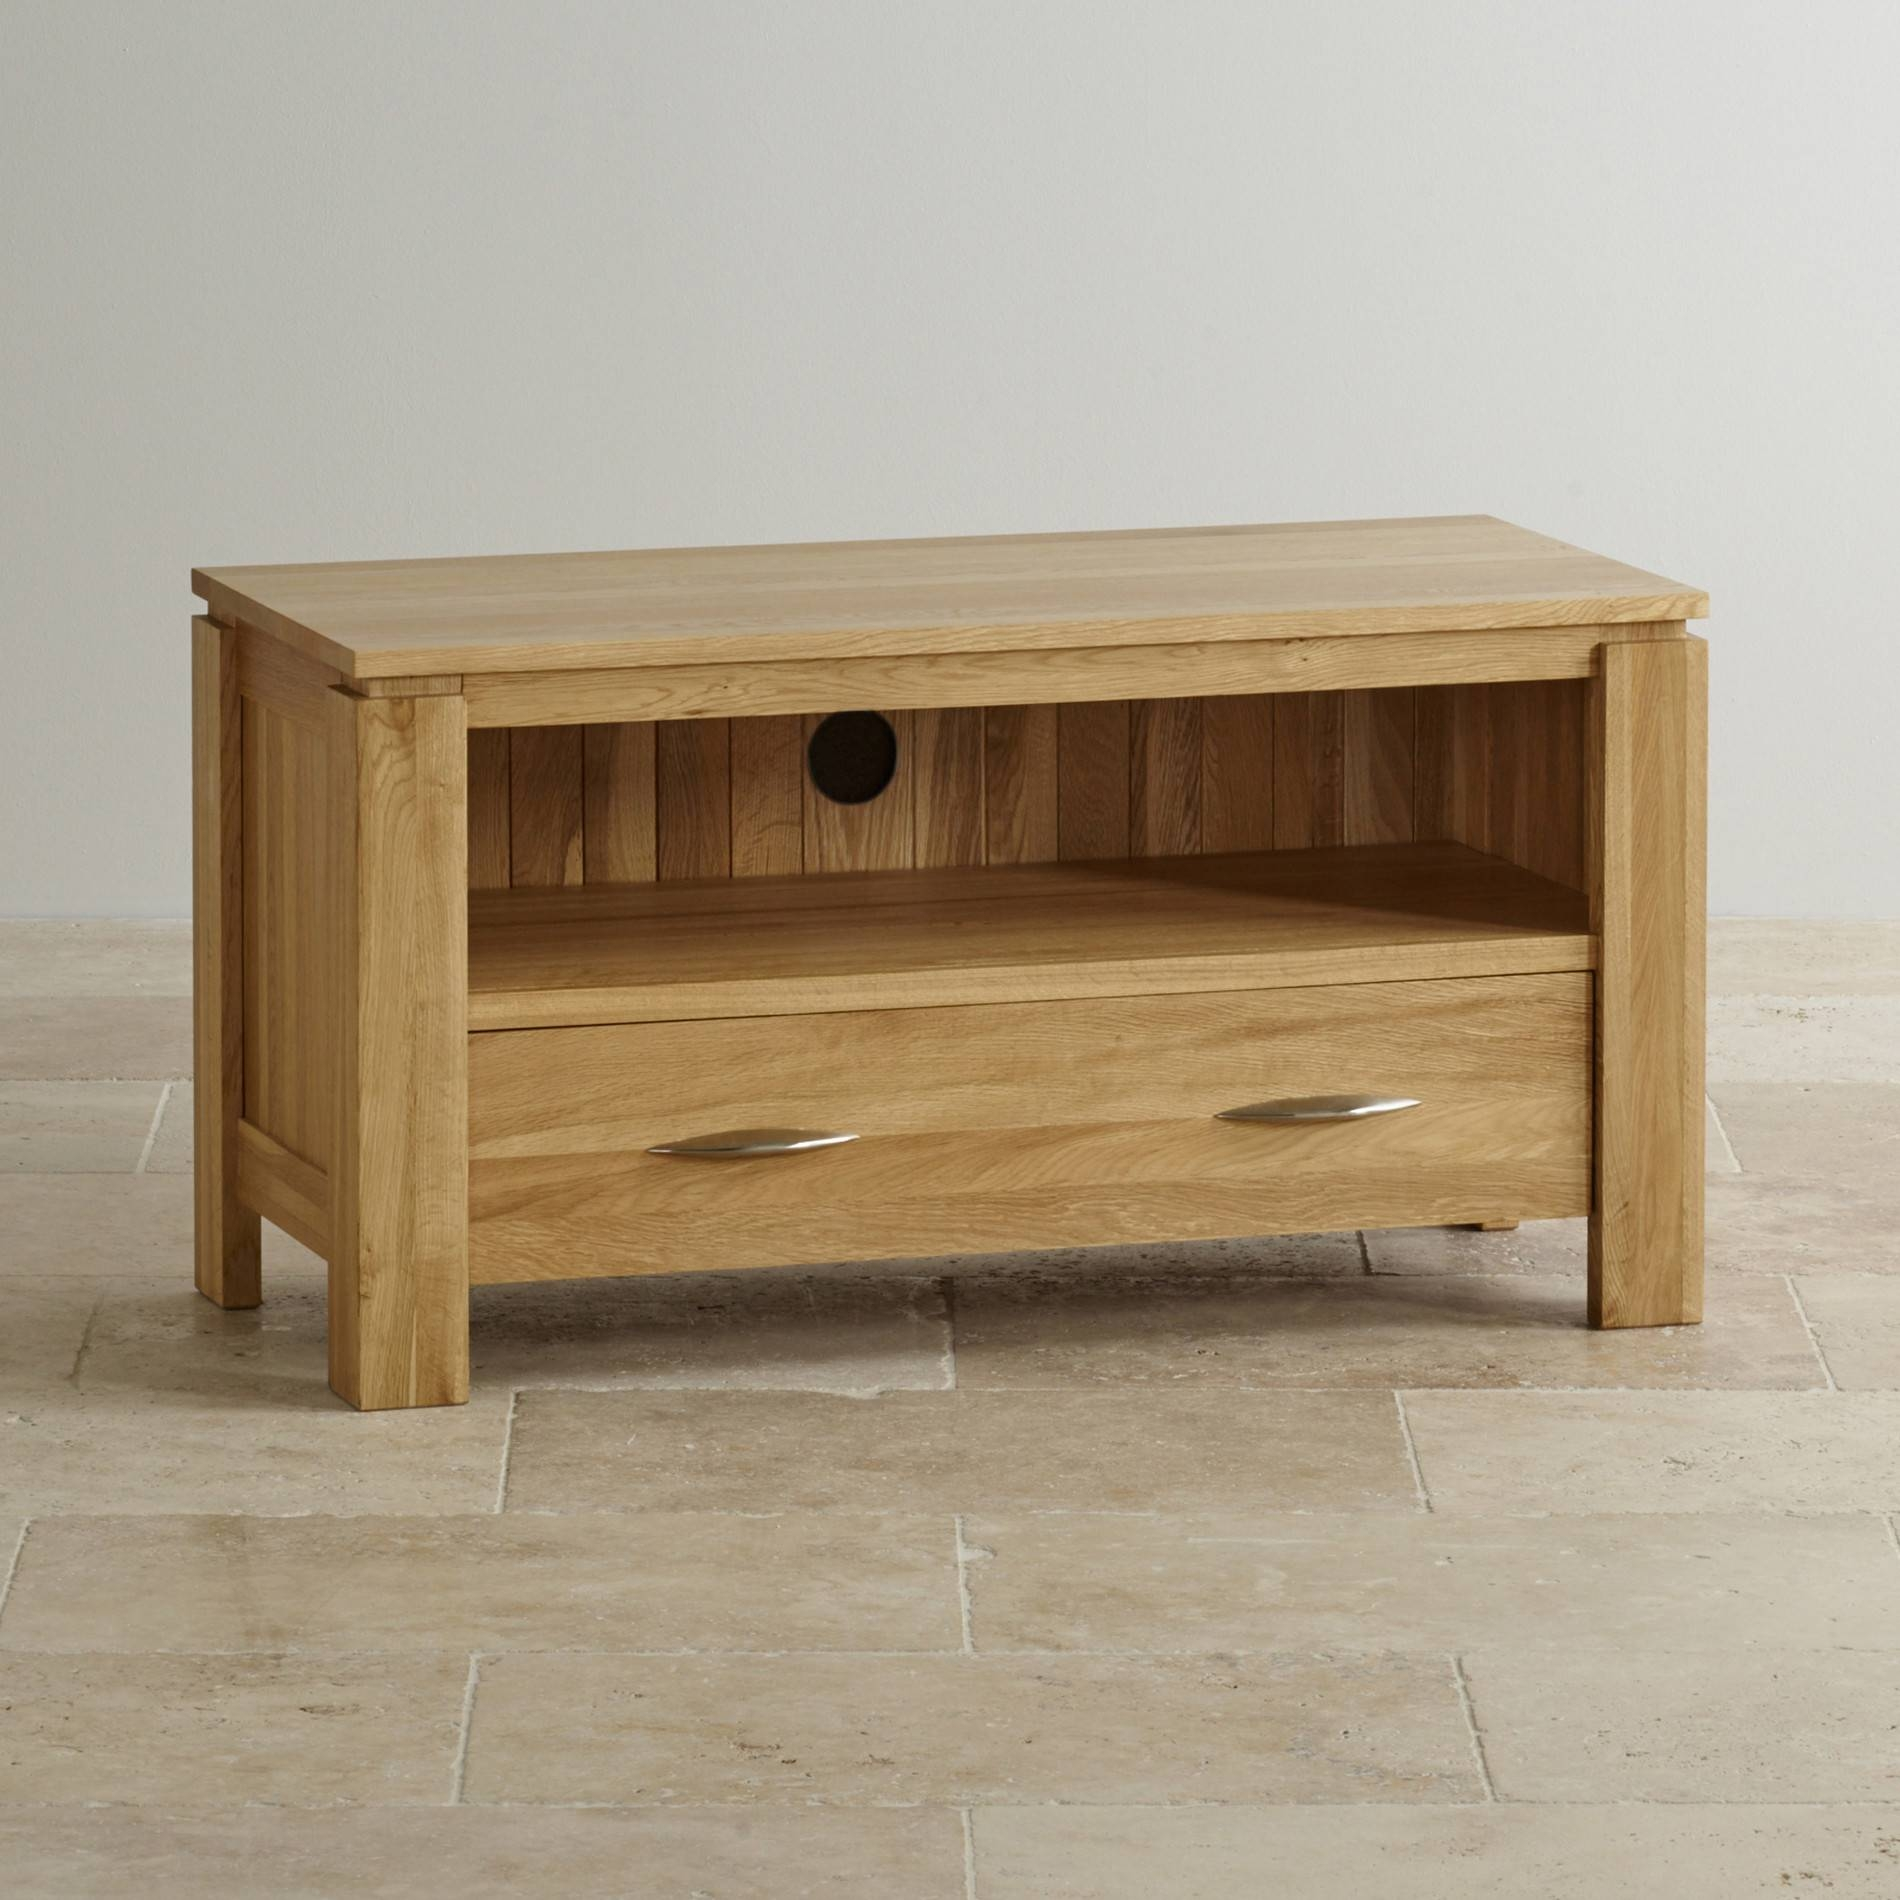 Tv Cabinets & Units | 100% Solid Oak | Oak Furniture Land intended for Oak Tv Cabinets For Flat Screens (Image 8 of 15)